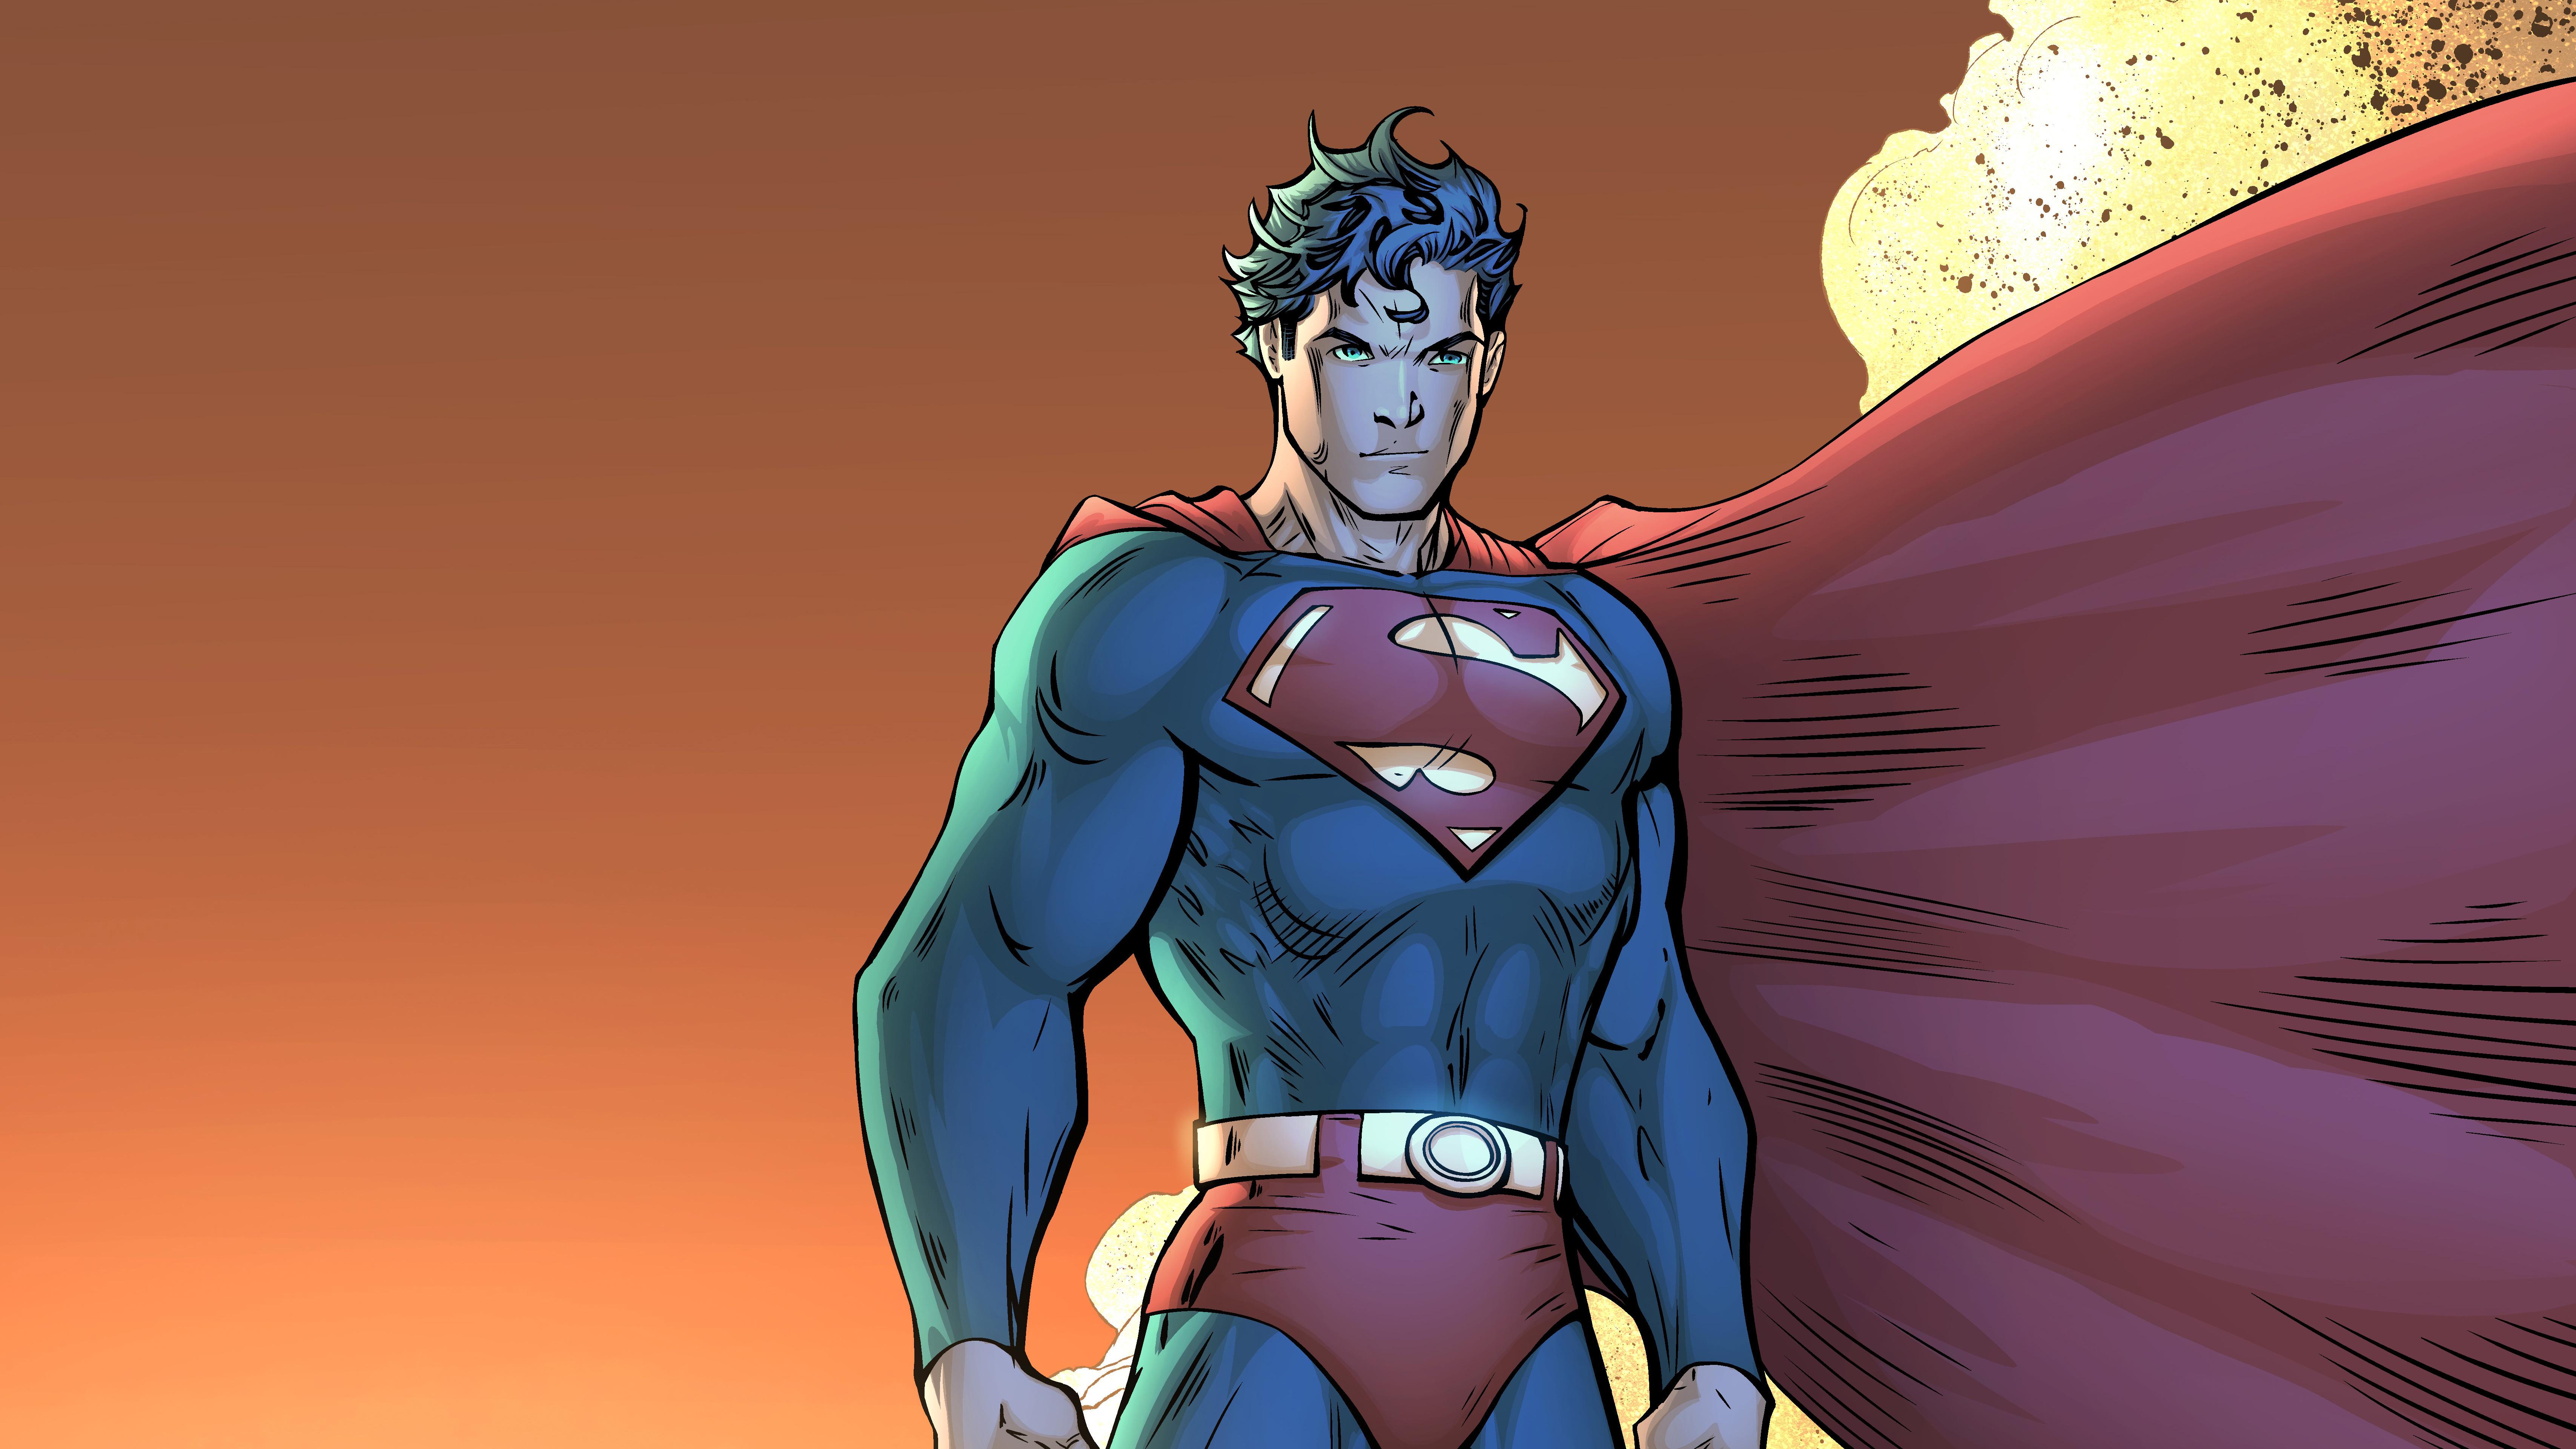 Superman Comic Book Poster 5k, HD Superheroes, 4k ...